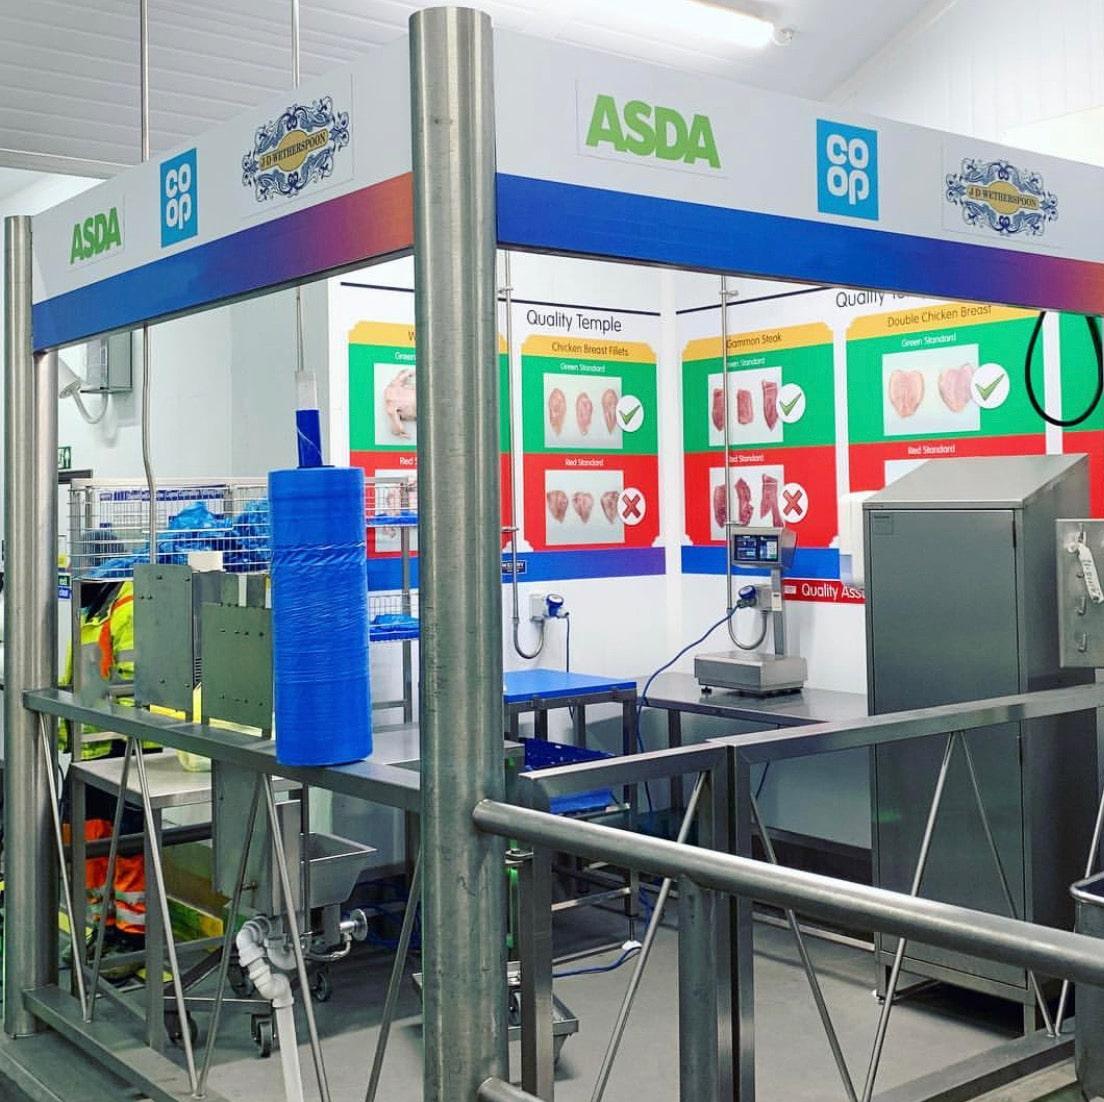 quality working area quality hub quality check station